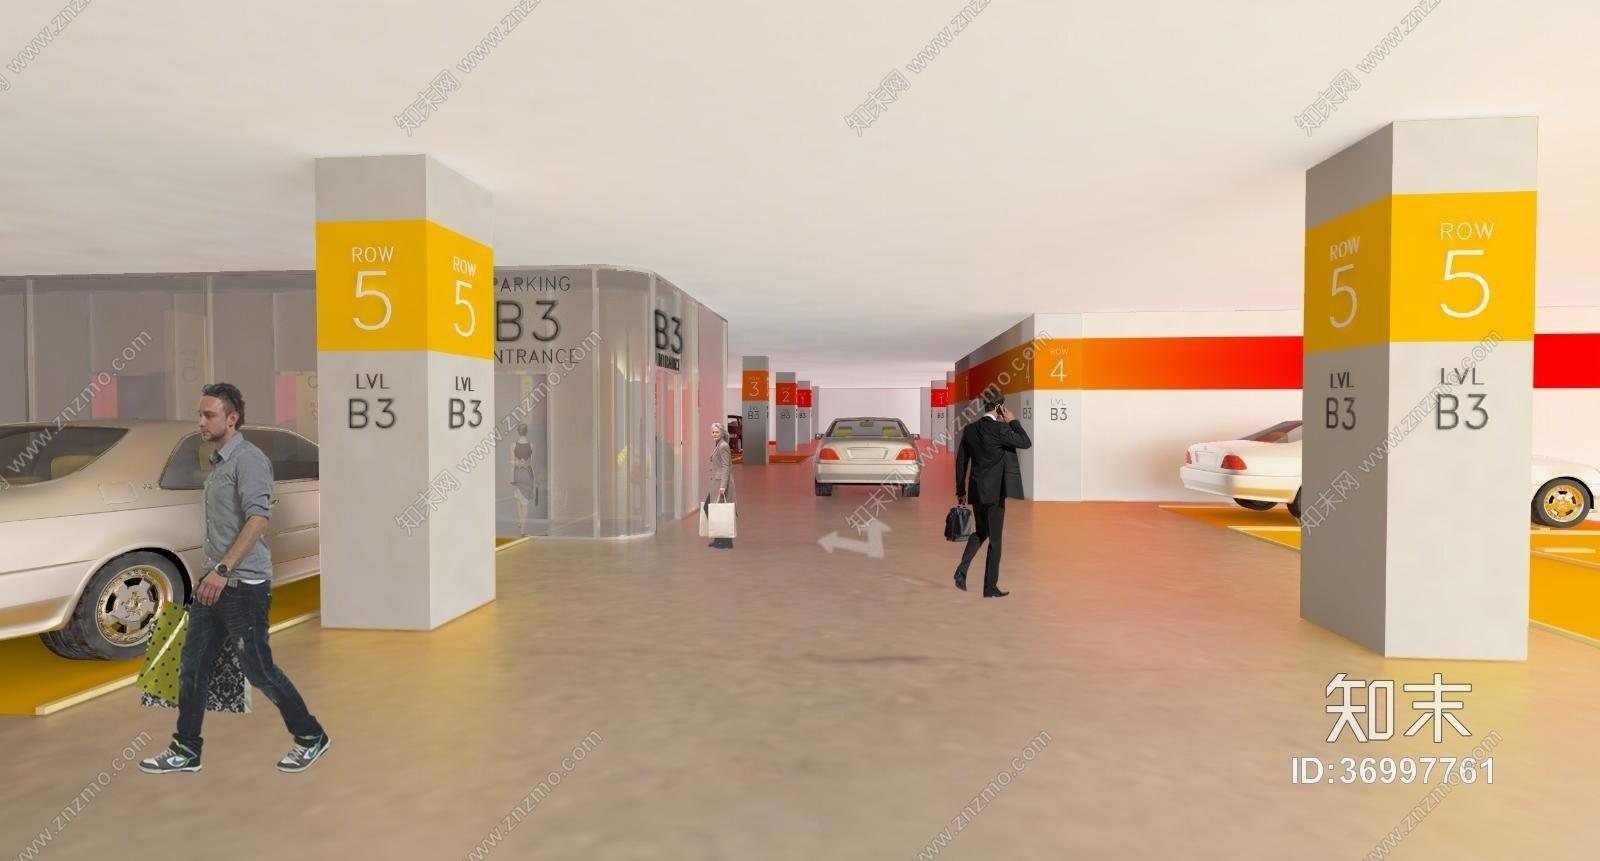 【UNStudio】上海西康∙189弄丨效果图+施工图+机电+标识丨1.52G施工图下载【ID:36997761】